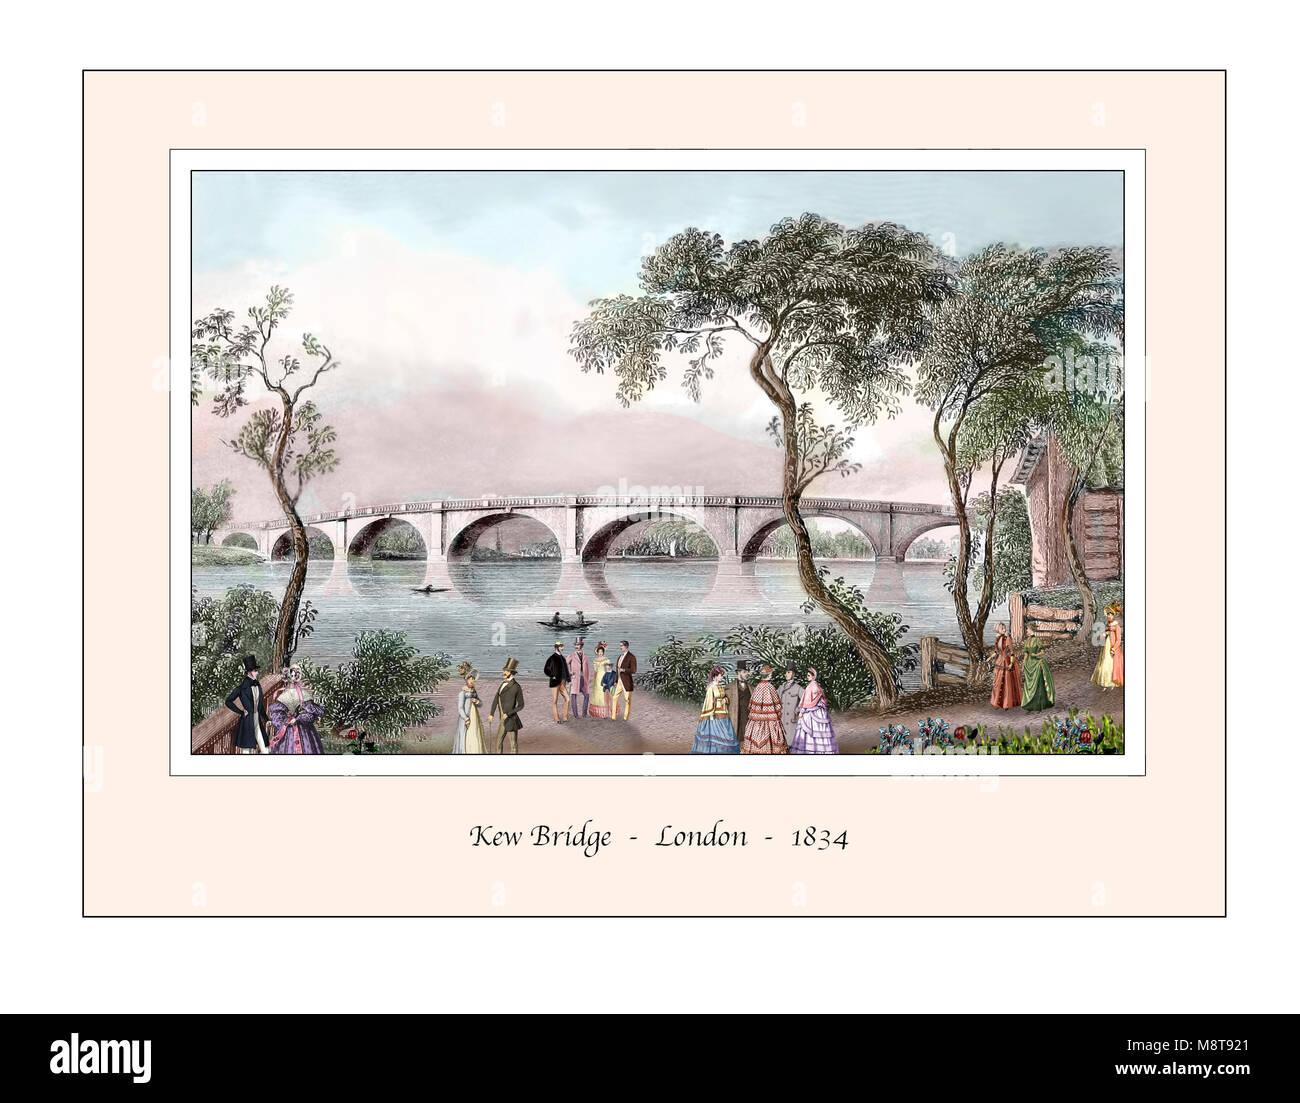 Kew Bridge London Original Design based on a 19th century Engraving - Stock Image